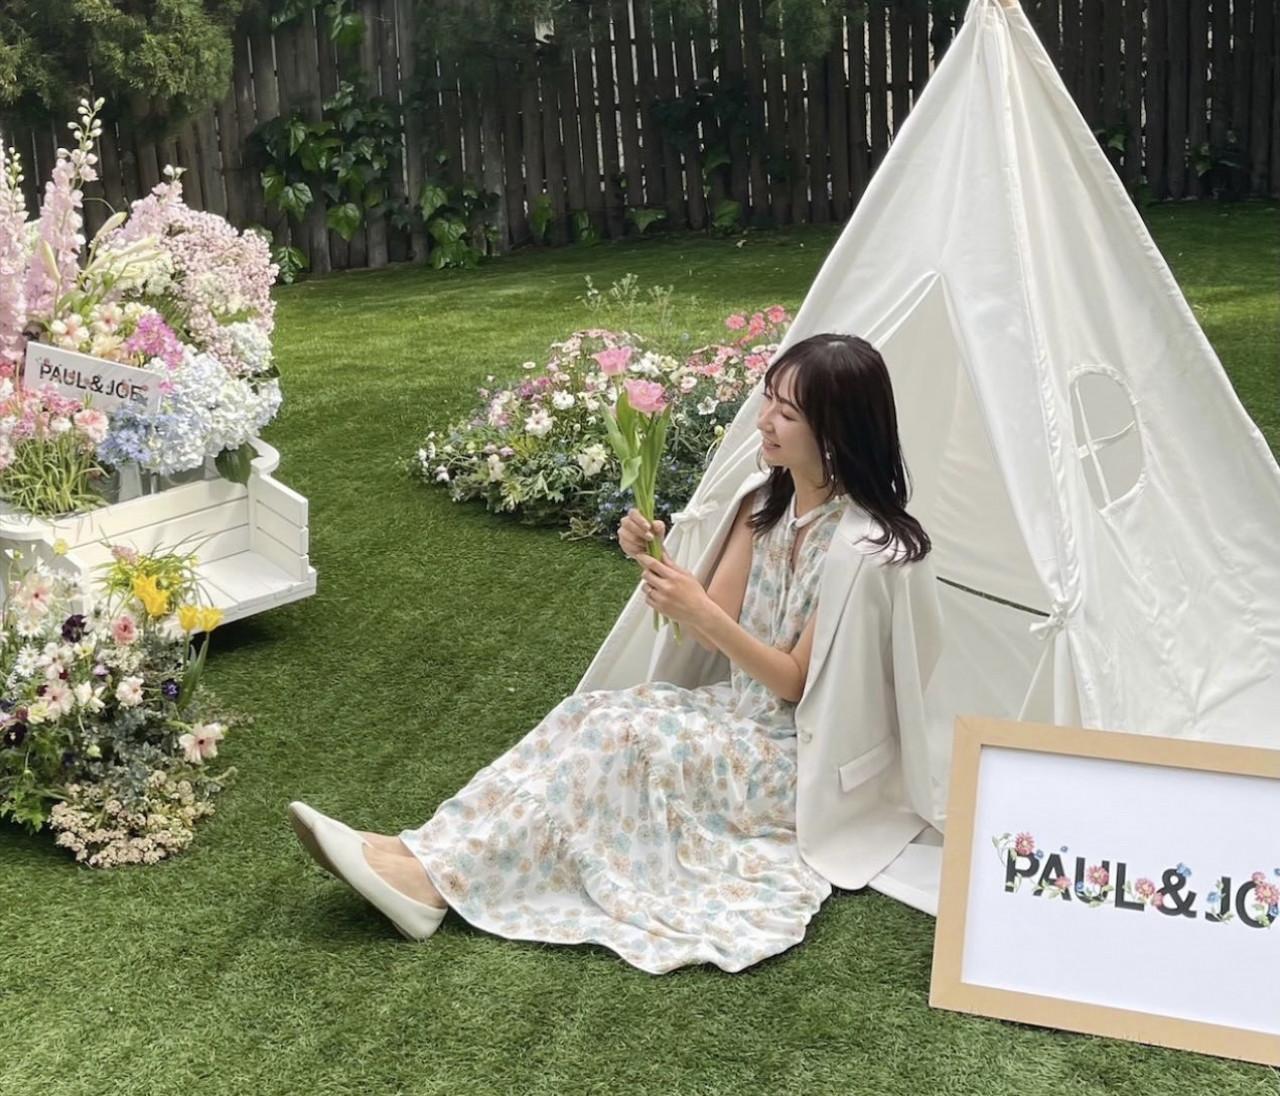 【UNIQLO】PAUL&JOEコラボ試着会へ♡